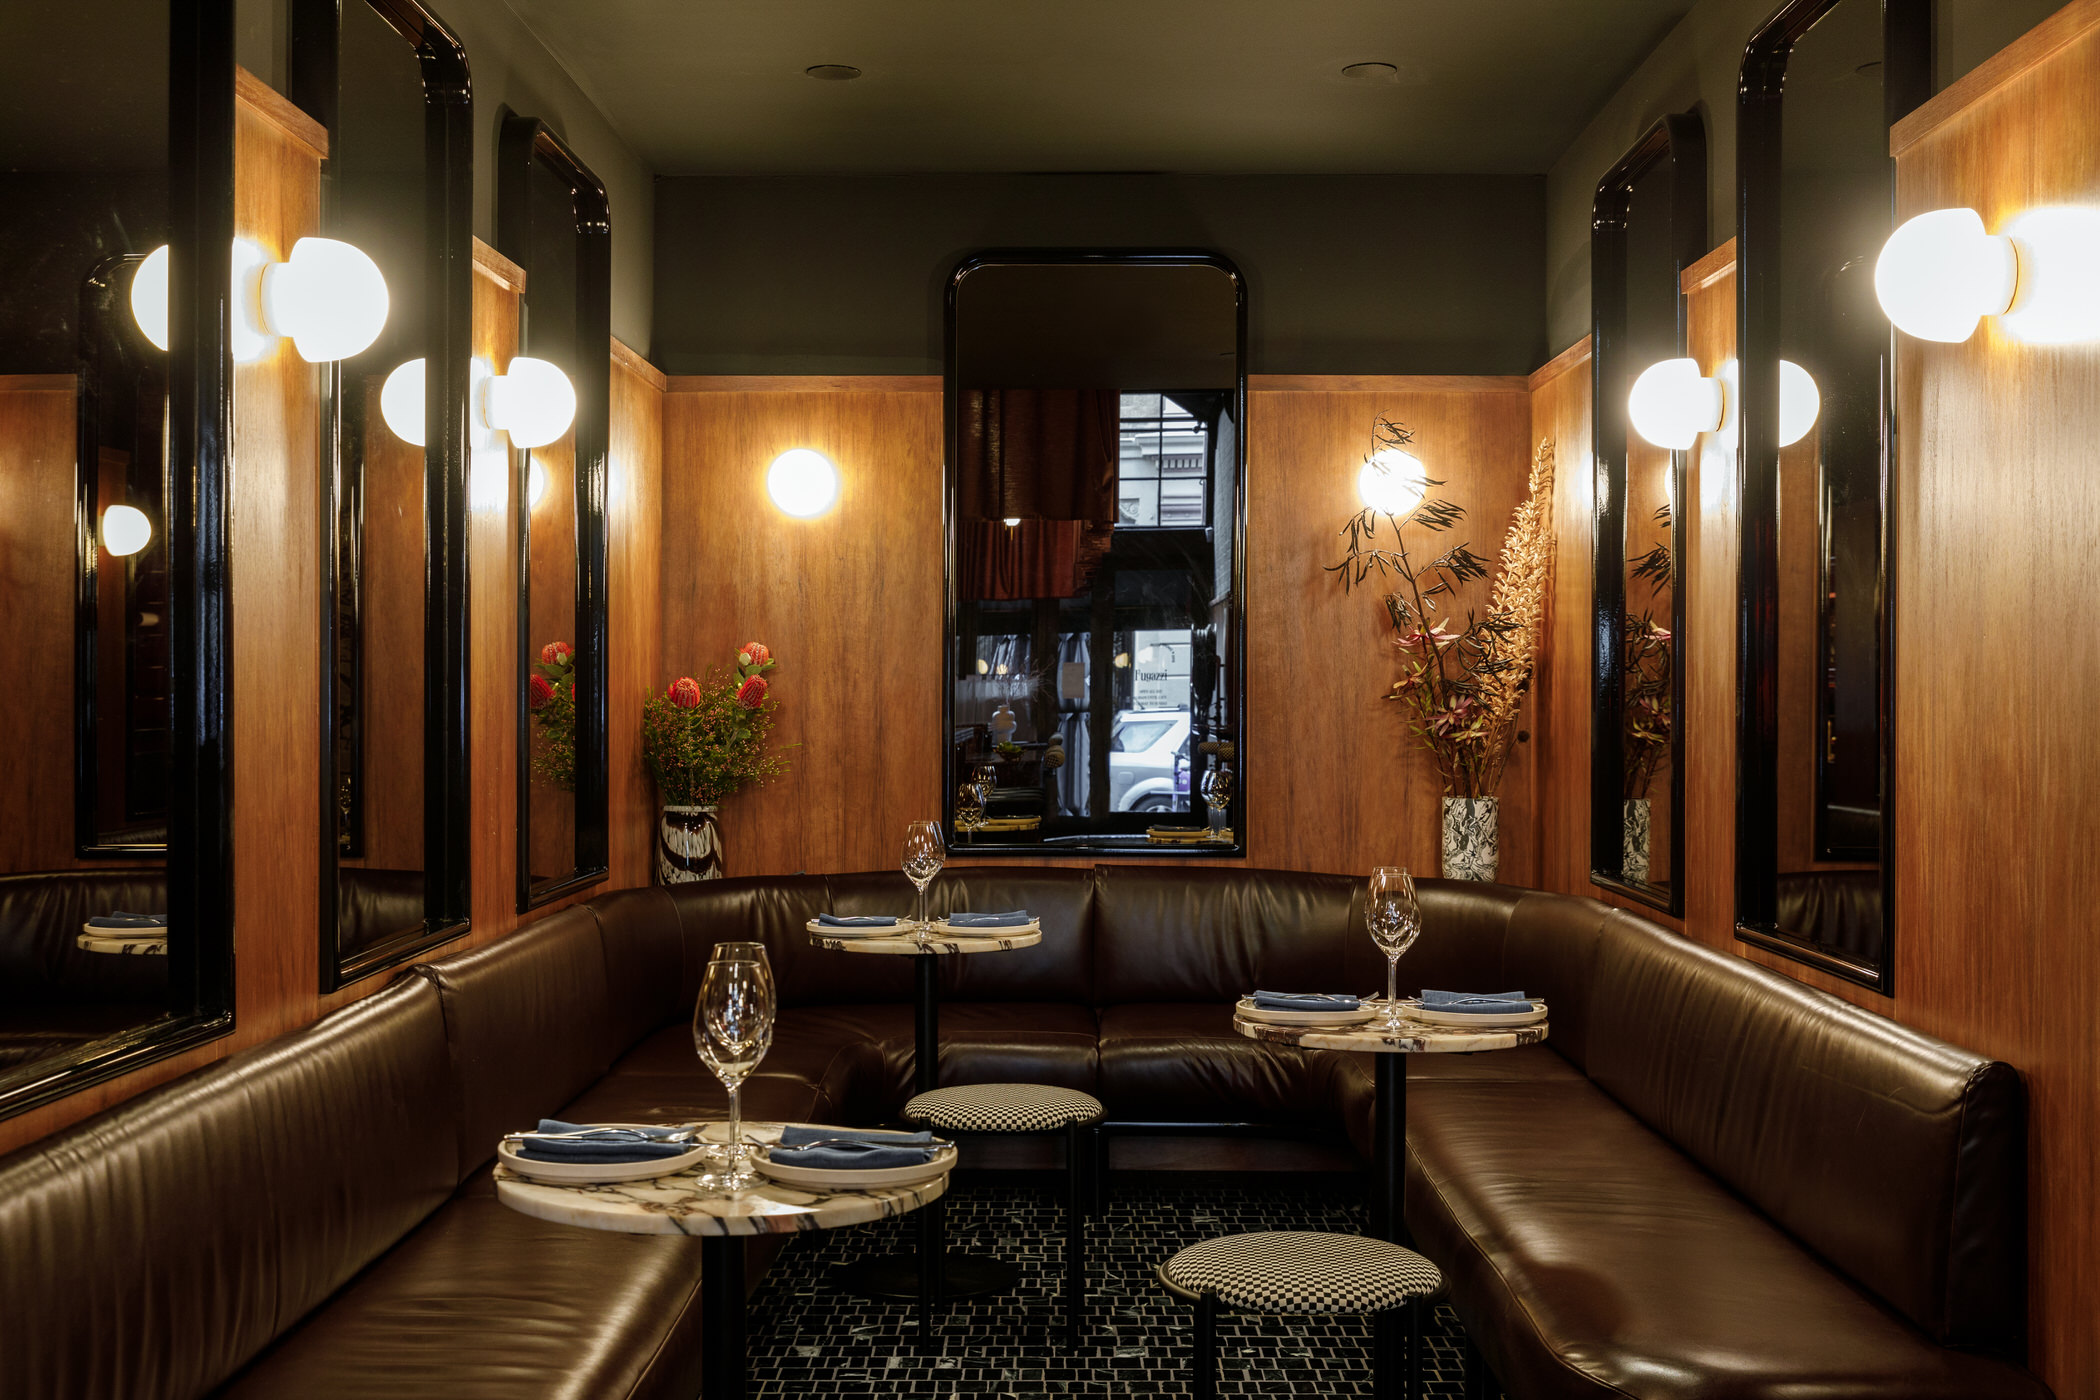 Studio Gram Fugazzi Adelaide Restaurant Bar Photo Jonathan Vdk Yellowtrace 17